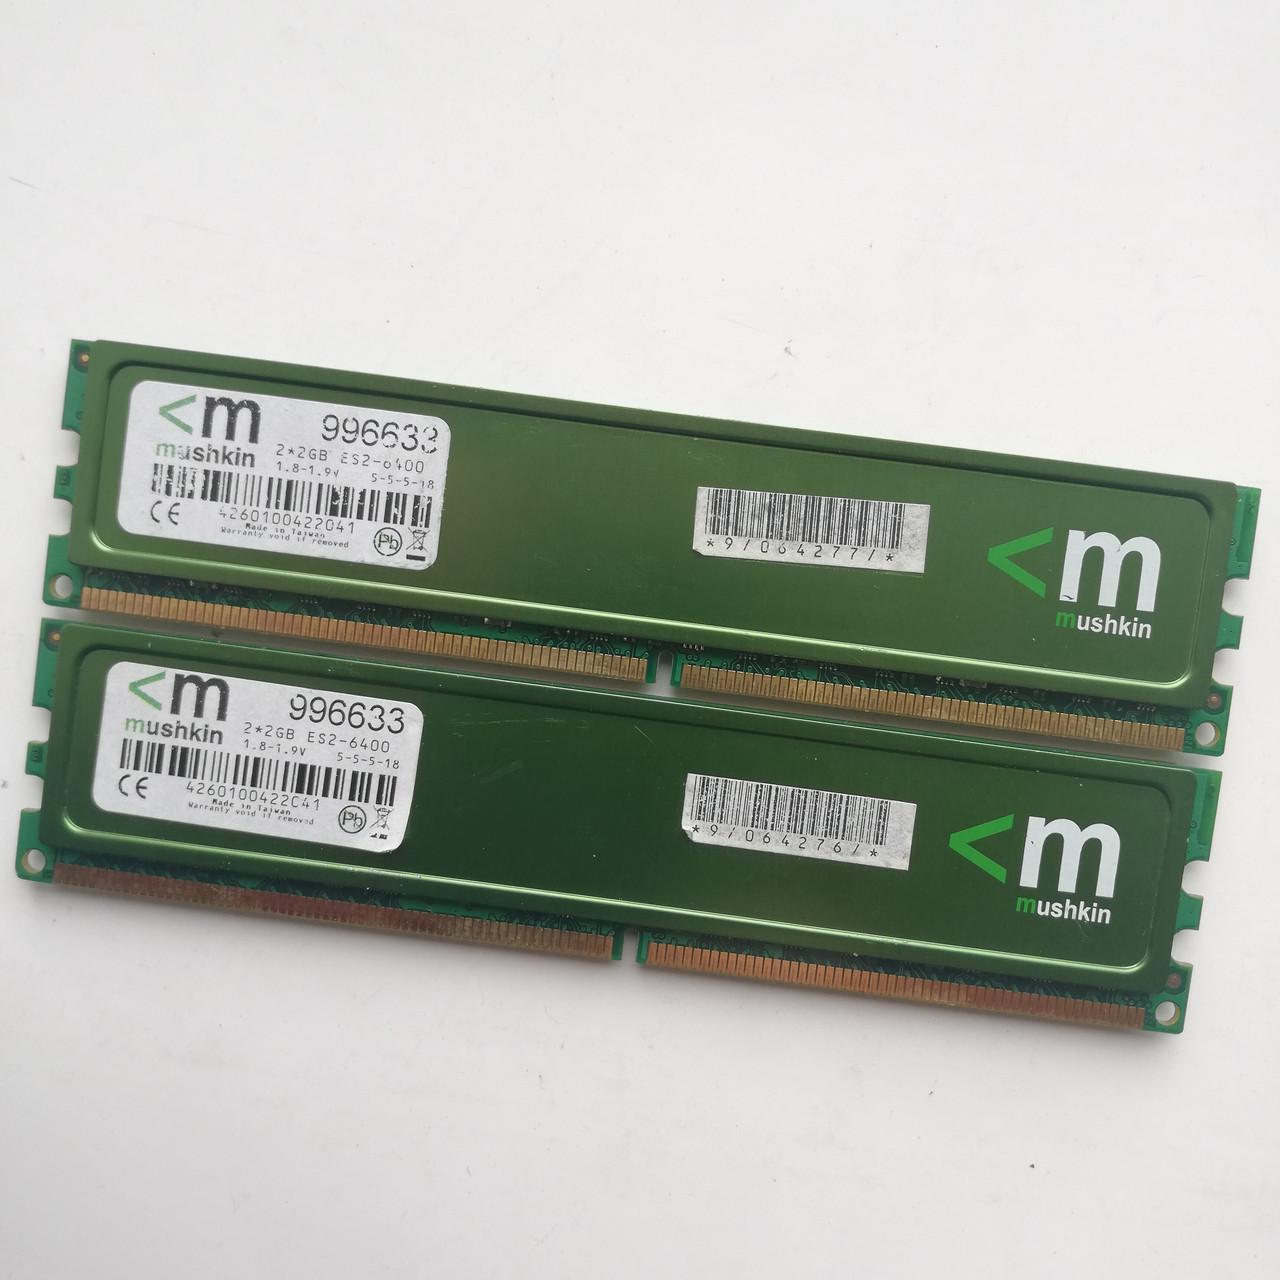 Комплект оперативной памяти Mushkin DDR2 4Gb (2Gb+2Gb) KIT of 2 800MHz PC2 6400U CL5 (996633) Б/У